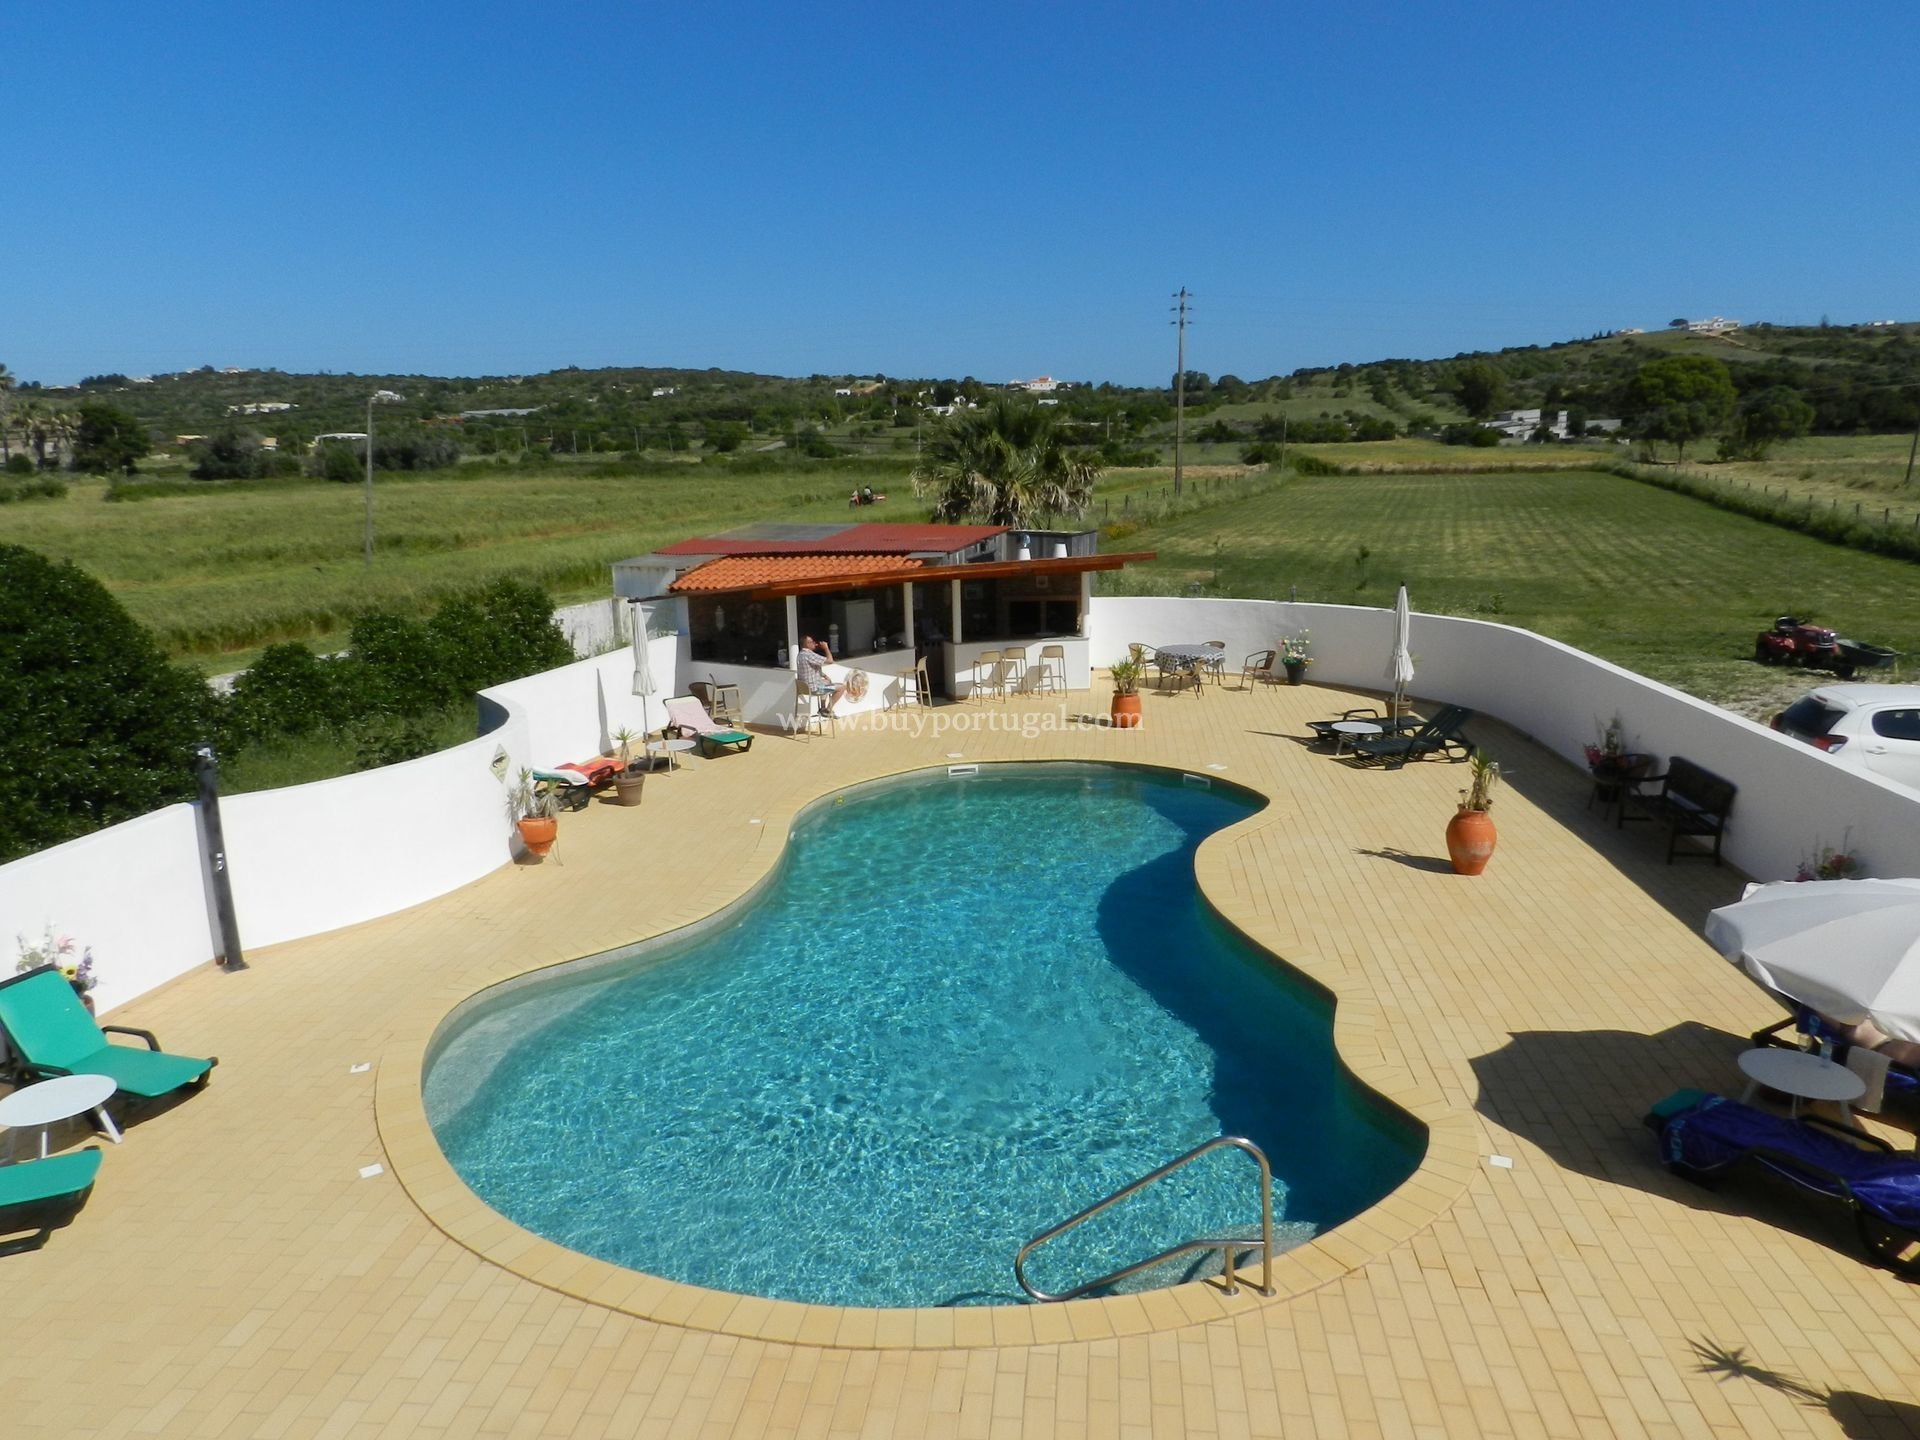 5 Bedroom Villa Praia da Luz, Western Algarve Ref: GV537